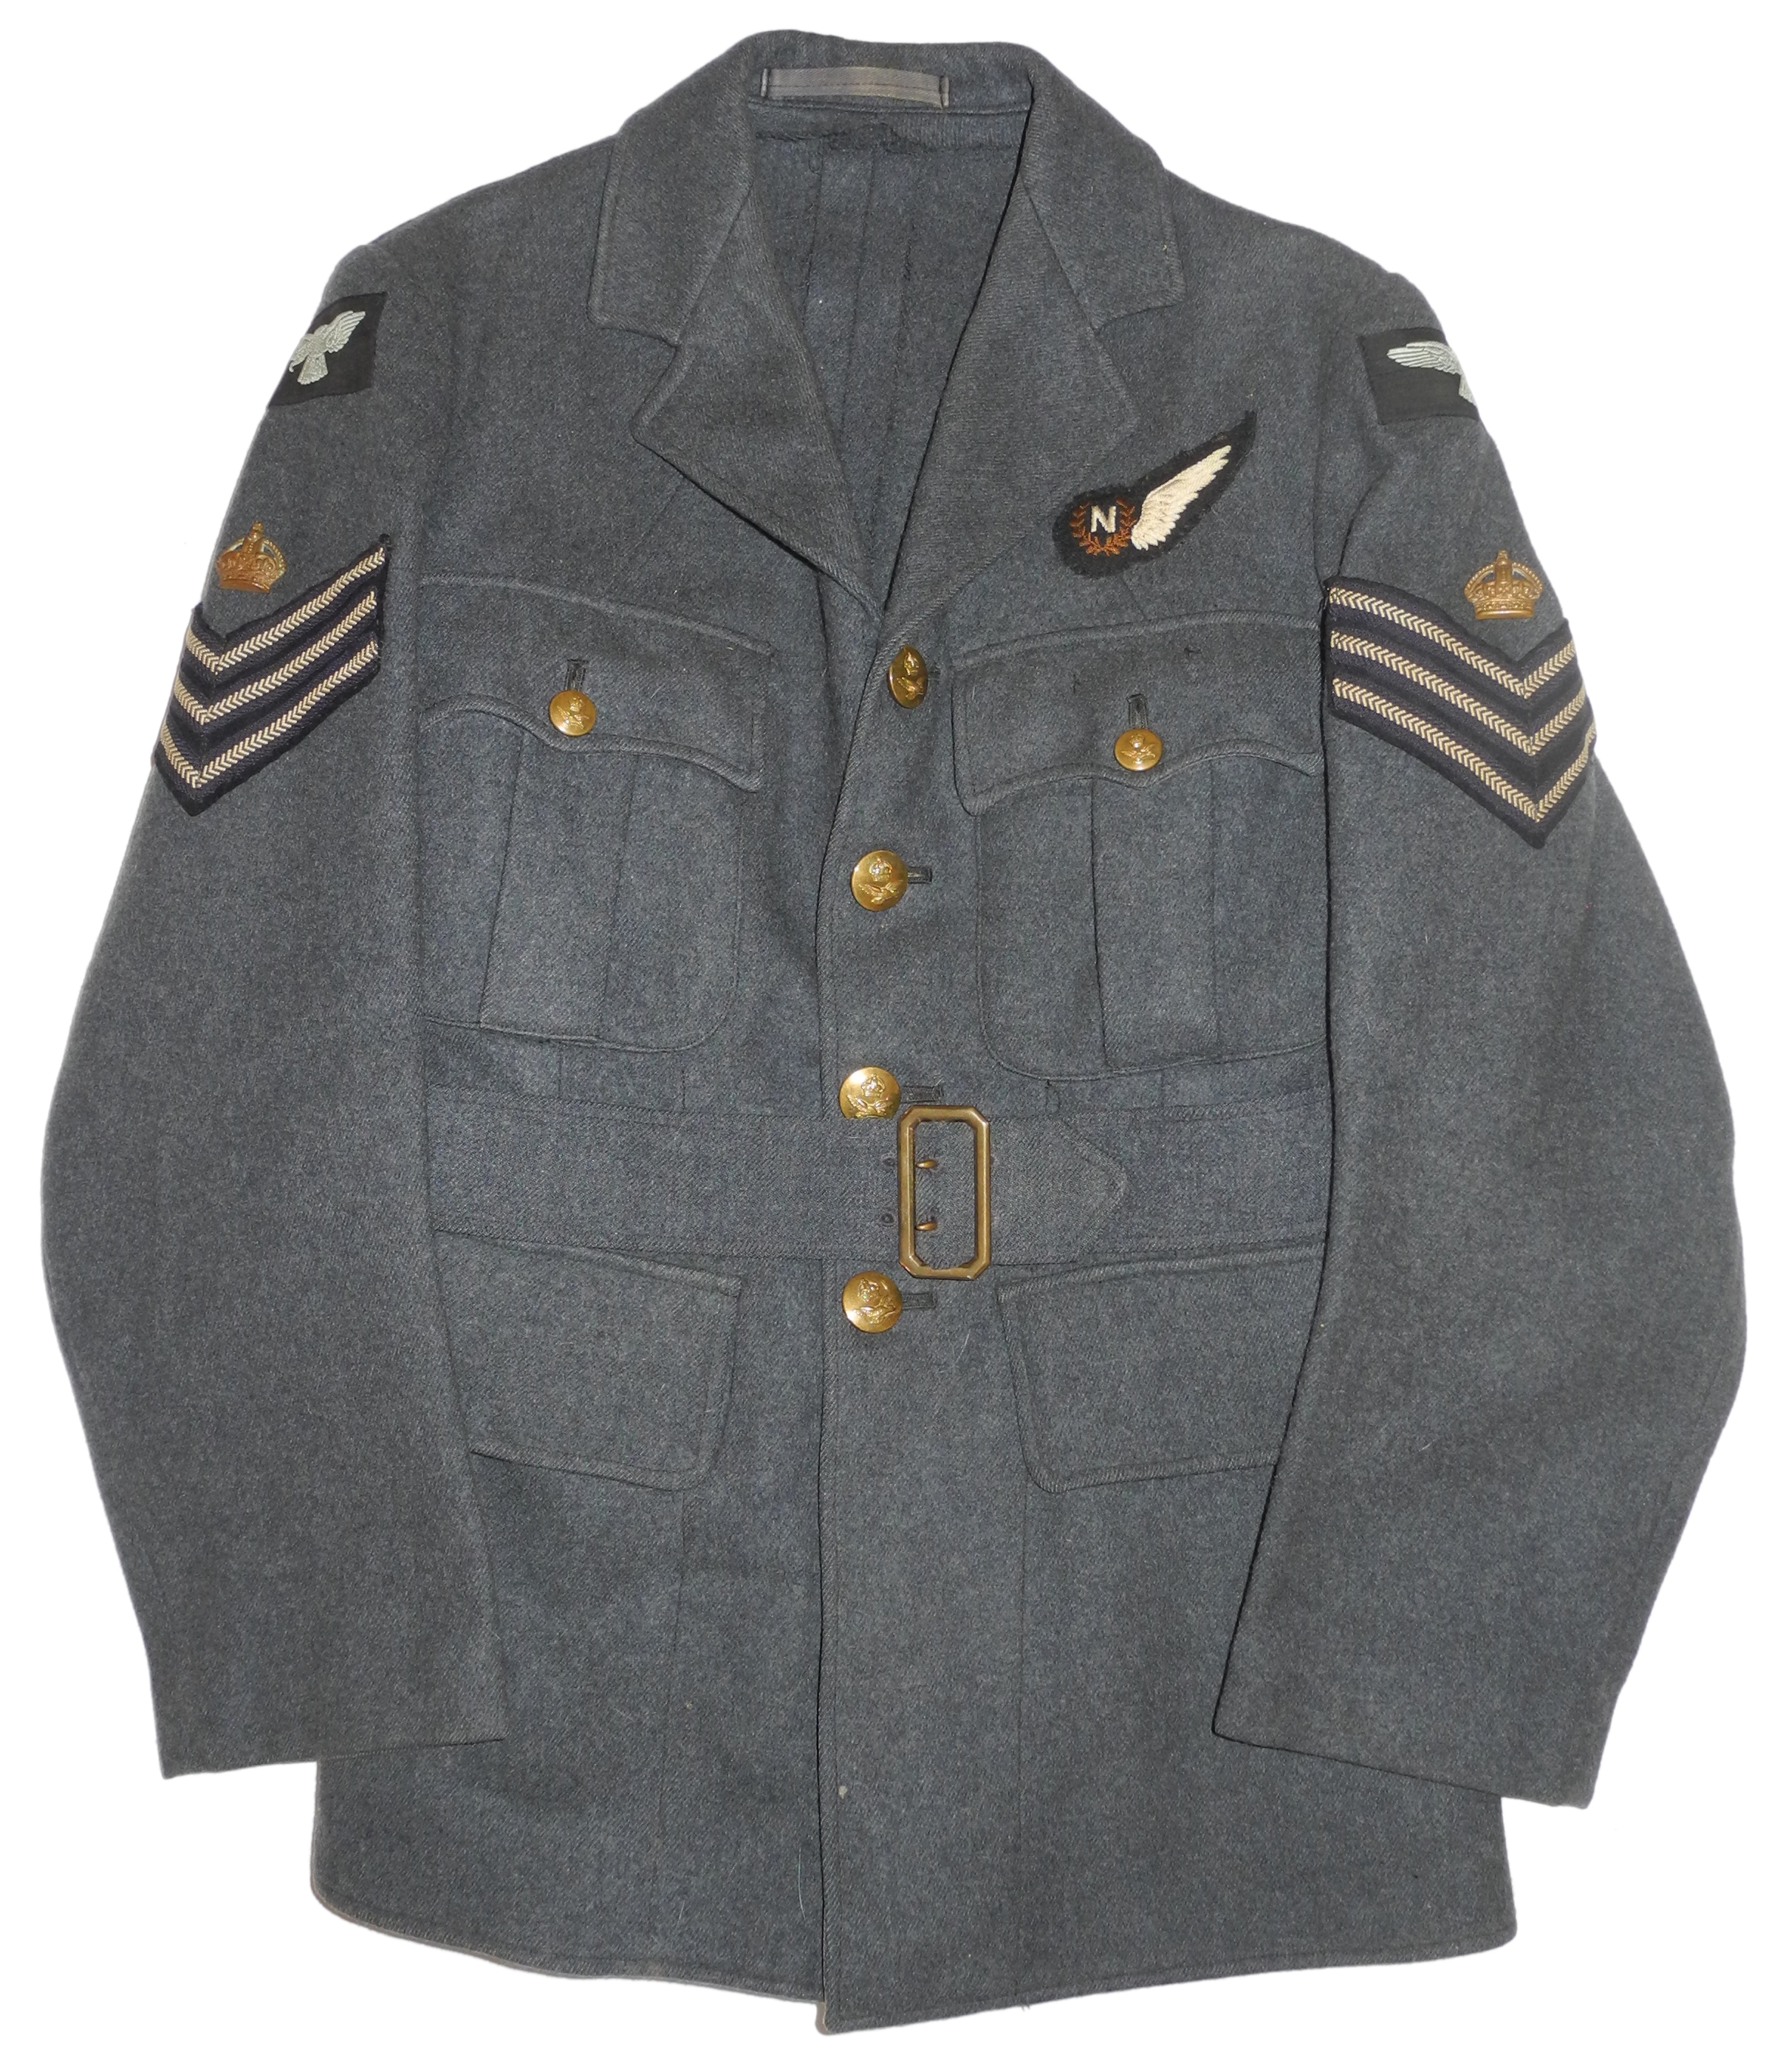 RAF Flt. Sgt. Navigator tunic 1941